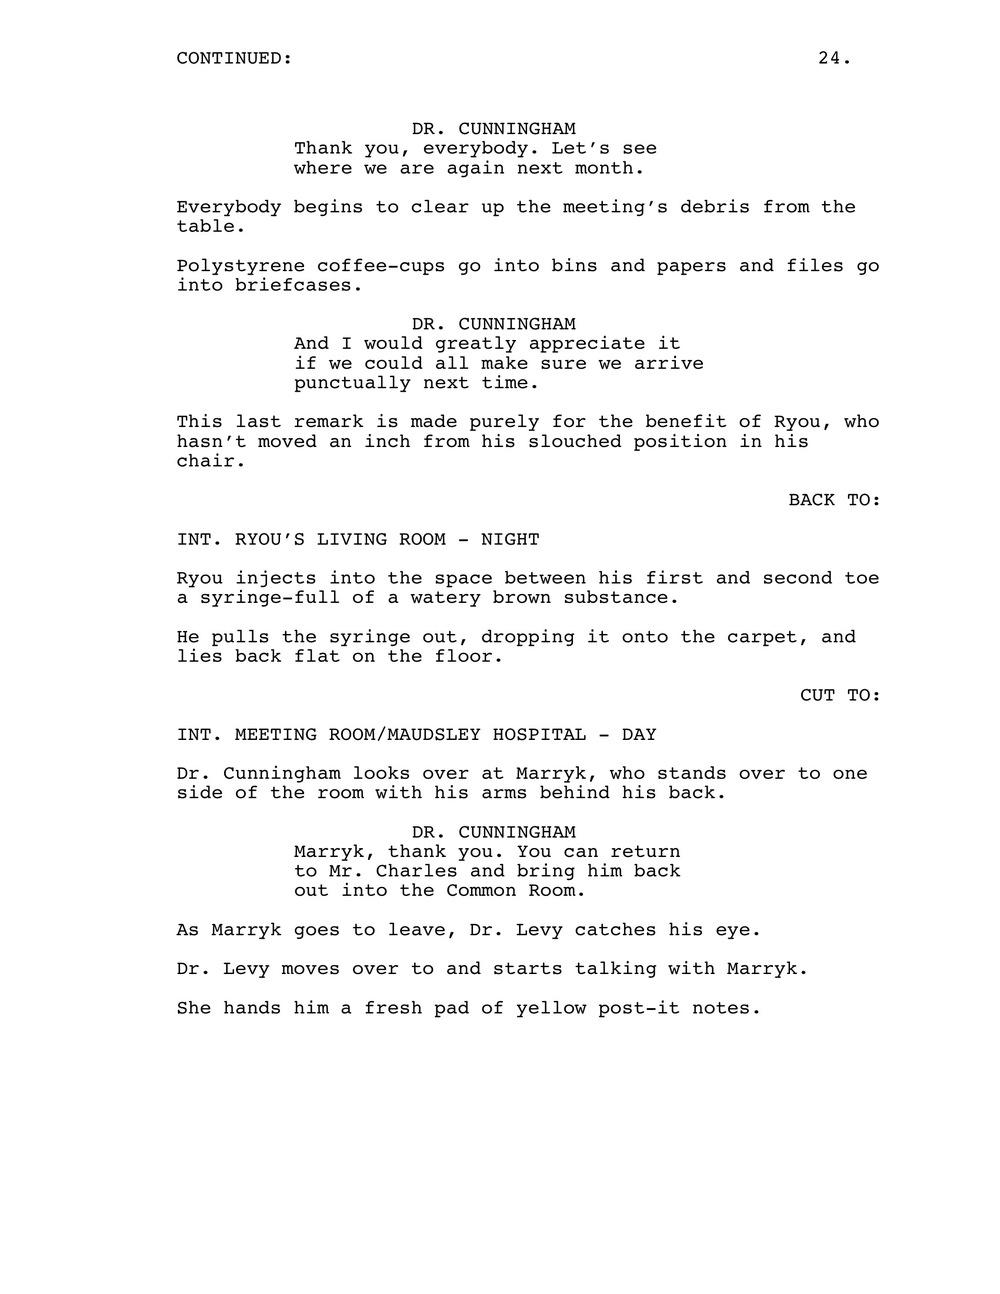 'Introducing Henry Charles' (Pilot) by Alexander Craig | 24.jpeg